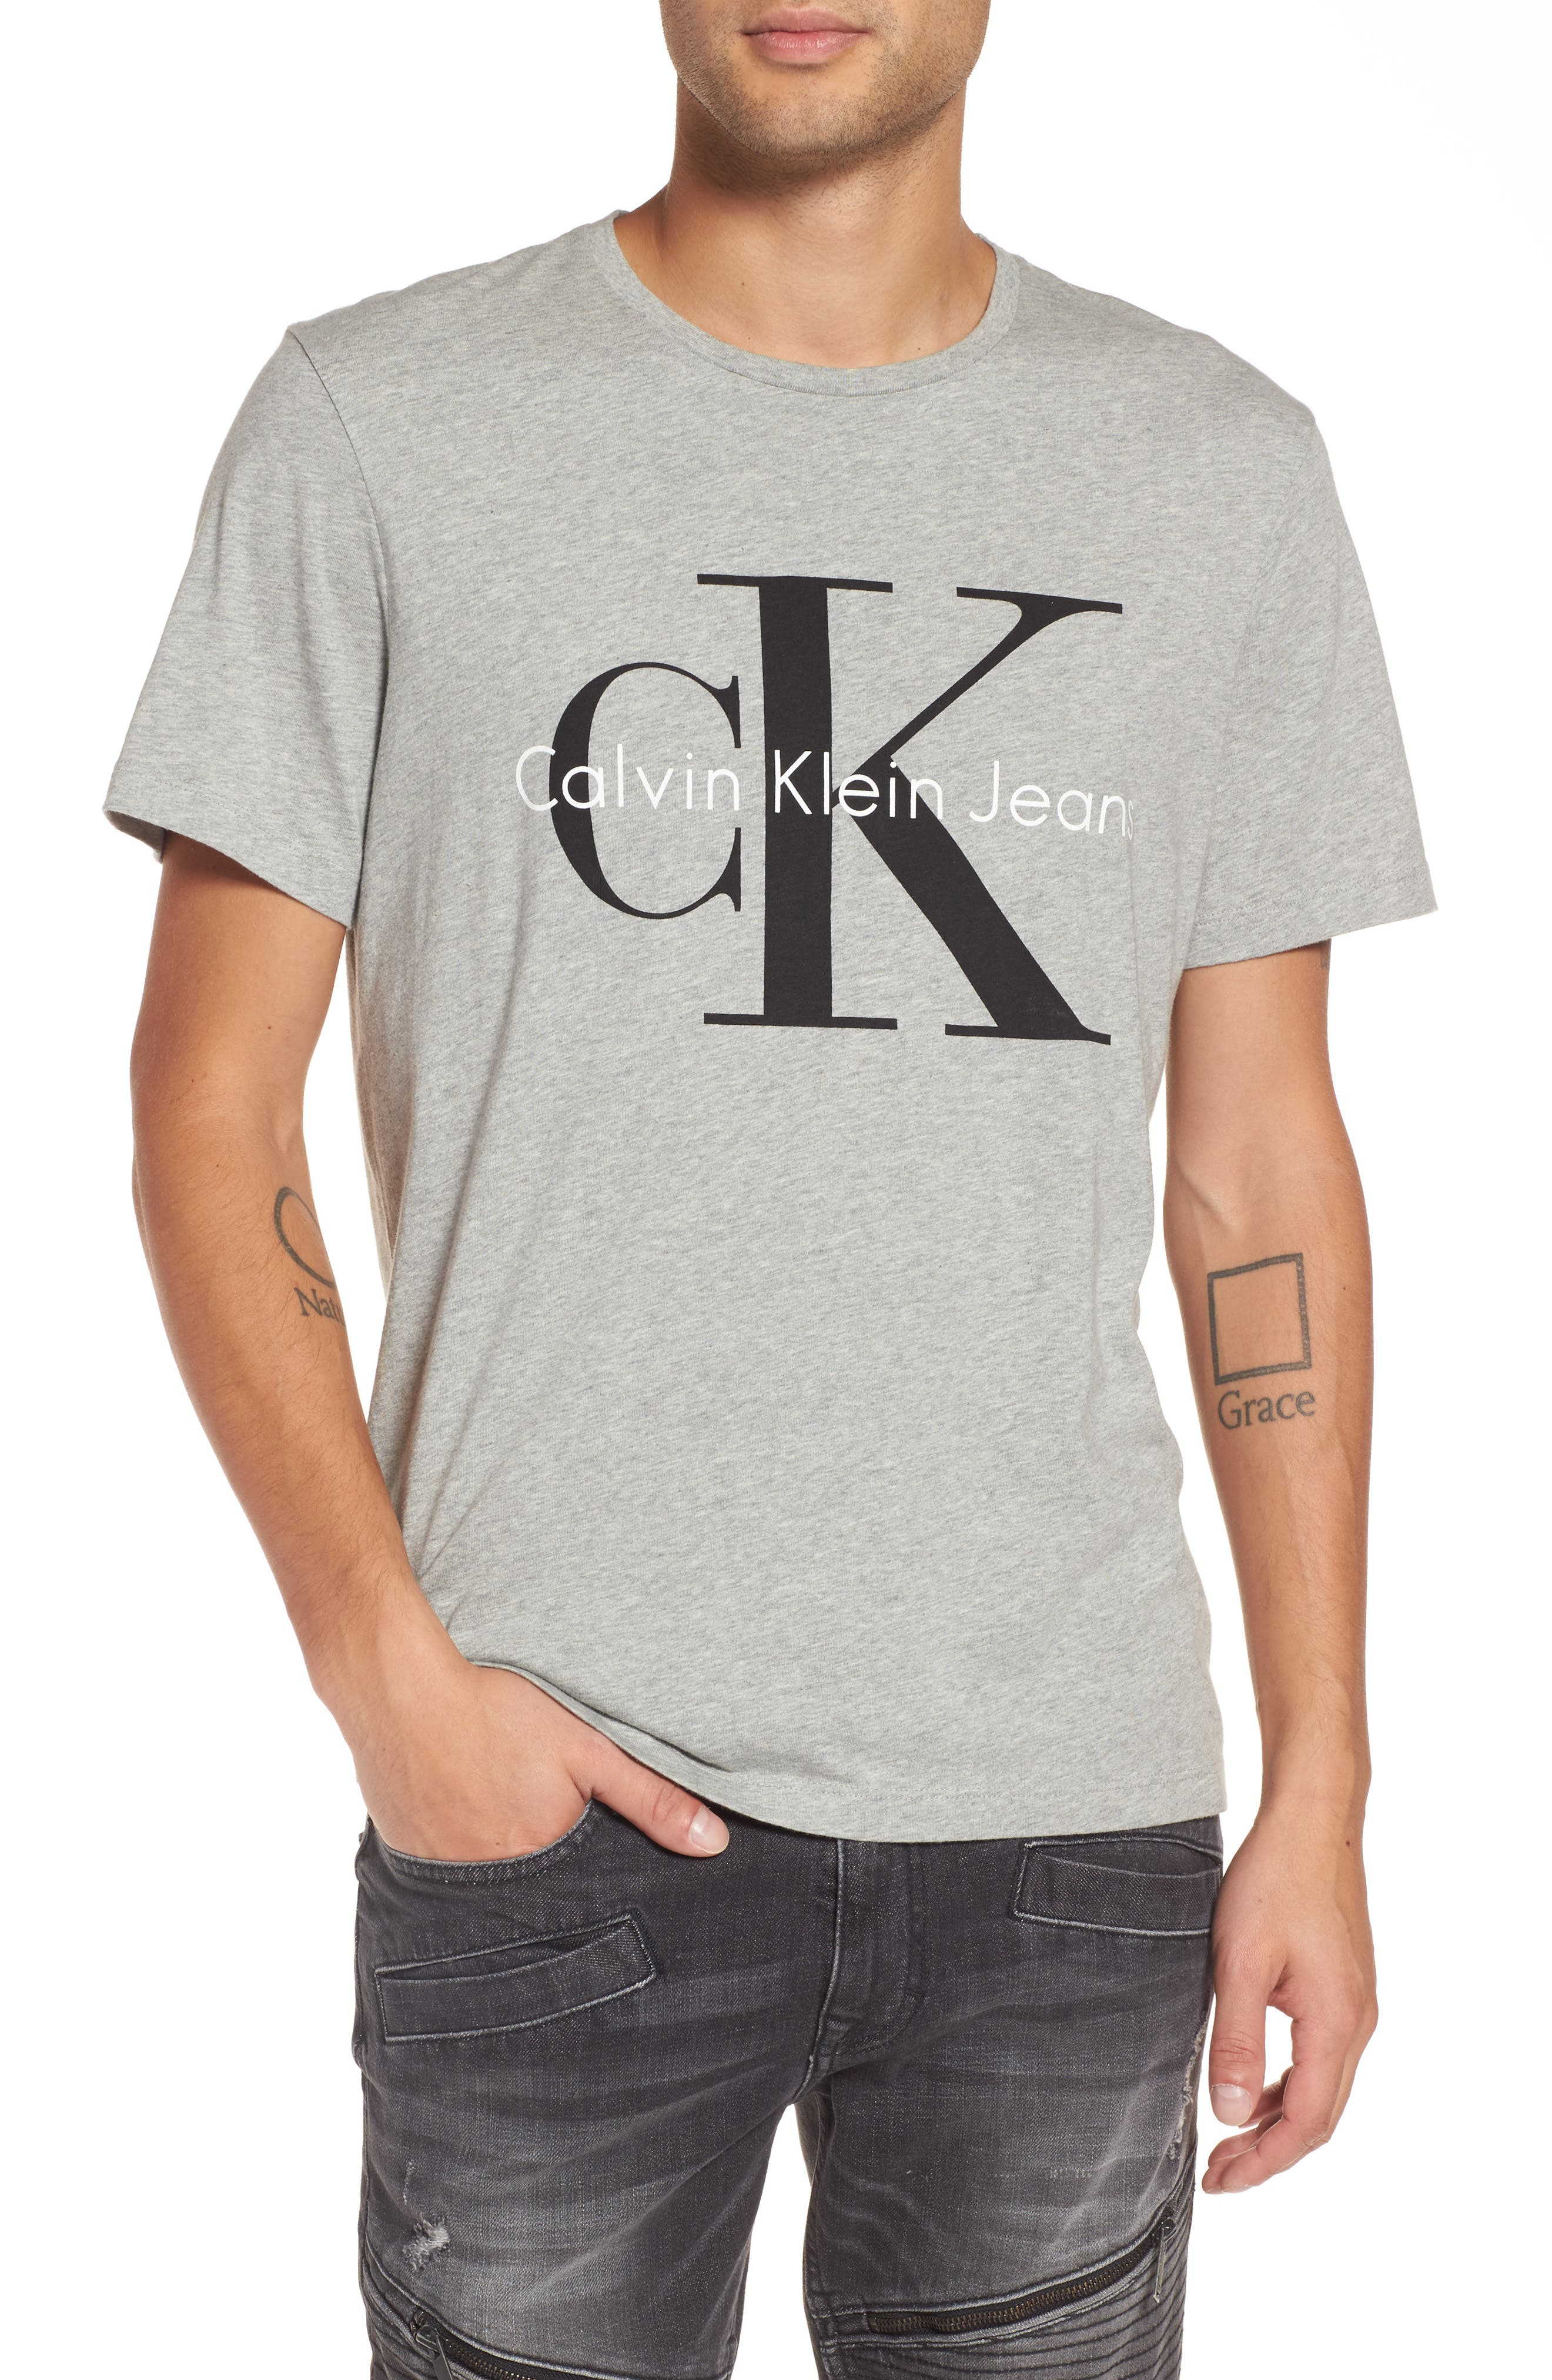 Calvin Klein Jeans Reissue T-Shirt